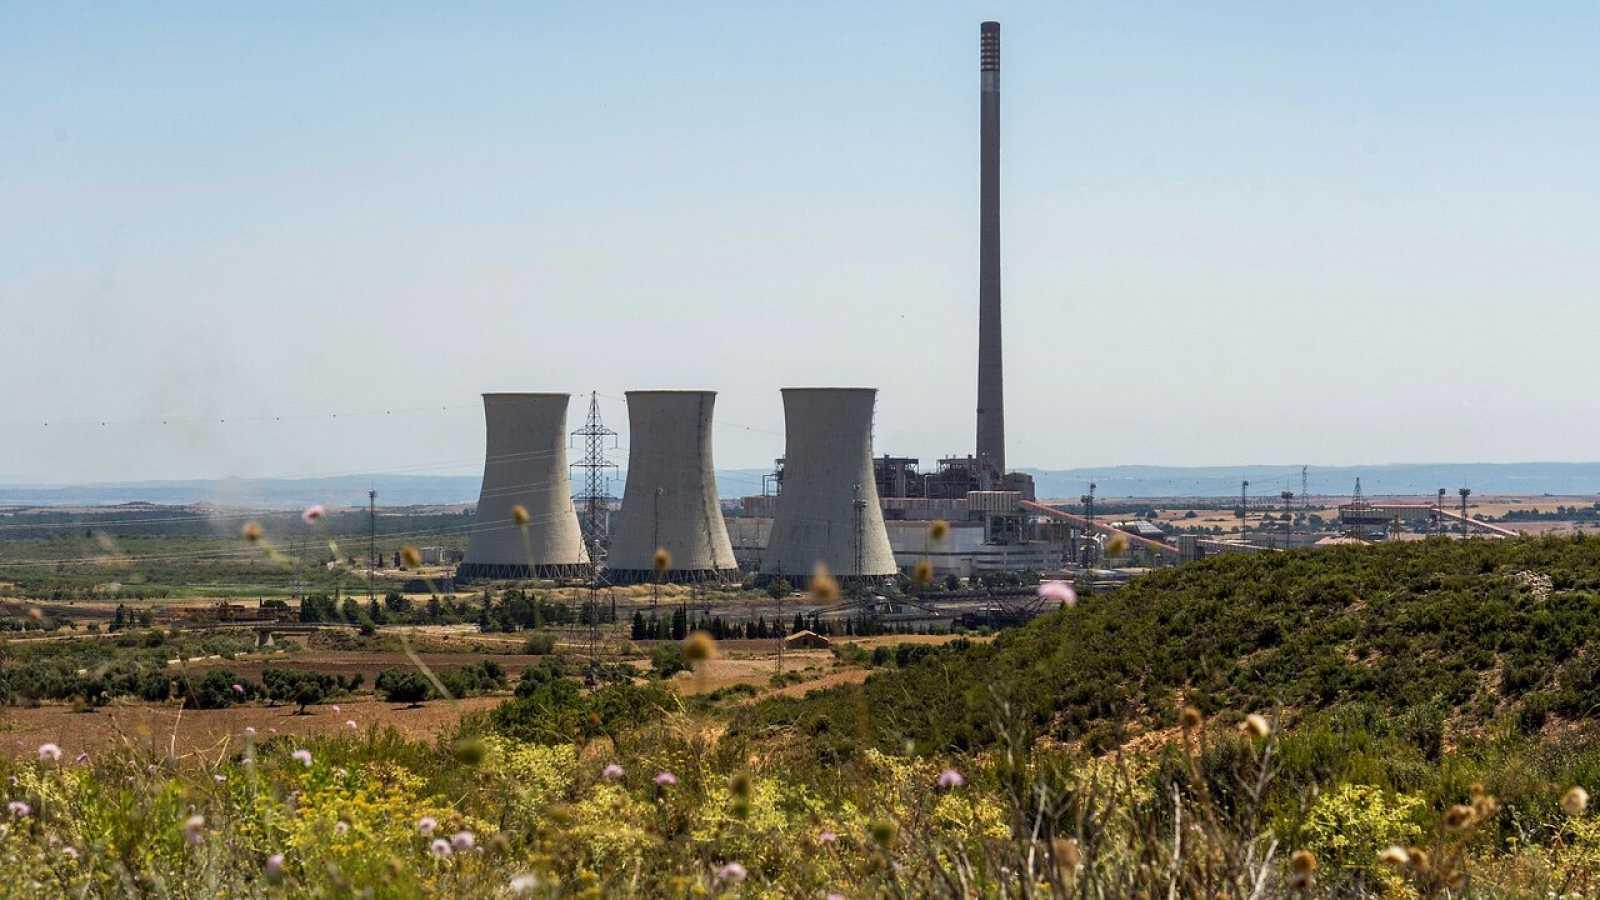 La central térmica de Andorra en Teruel se apaga definitivamente